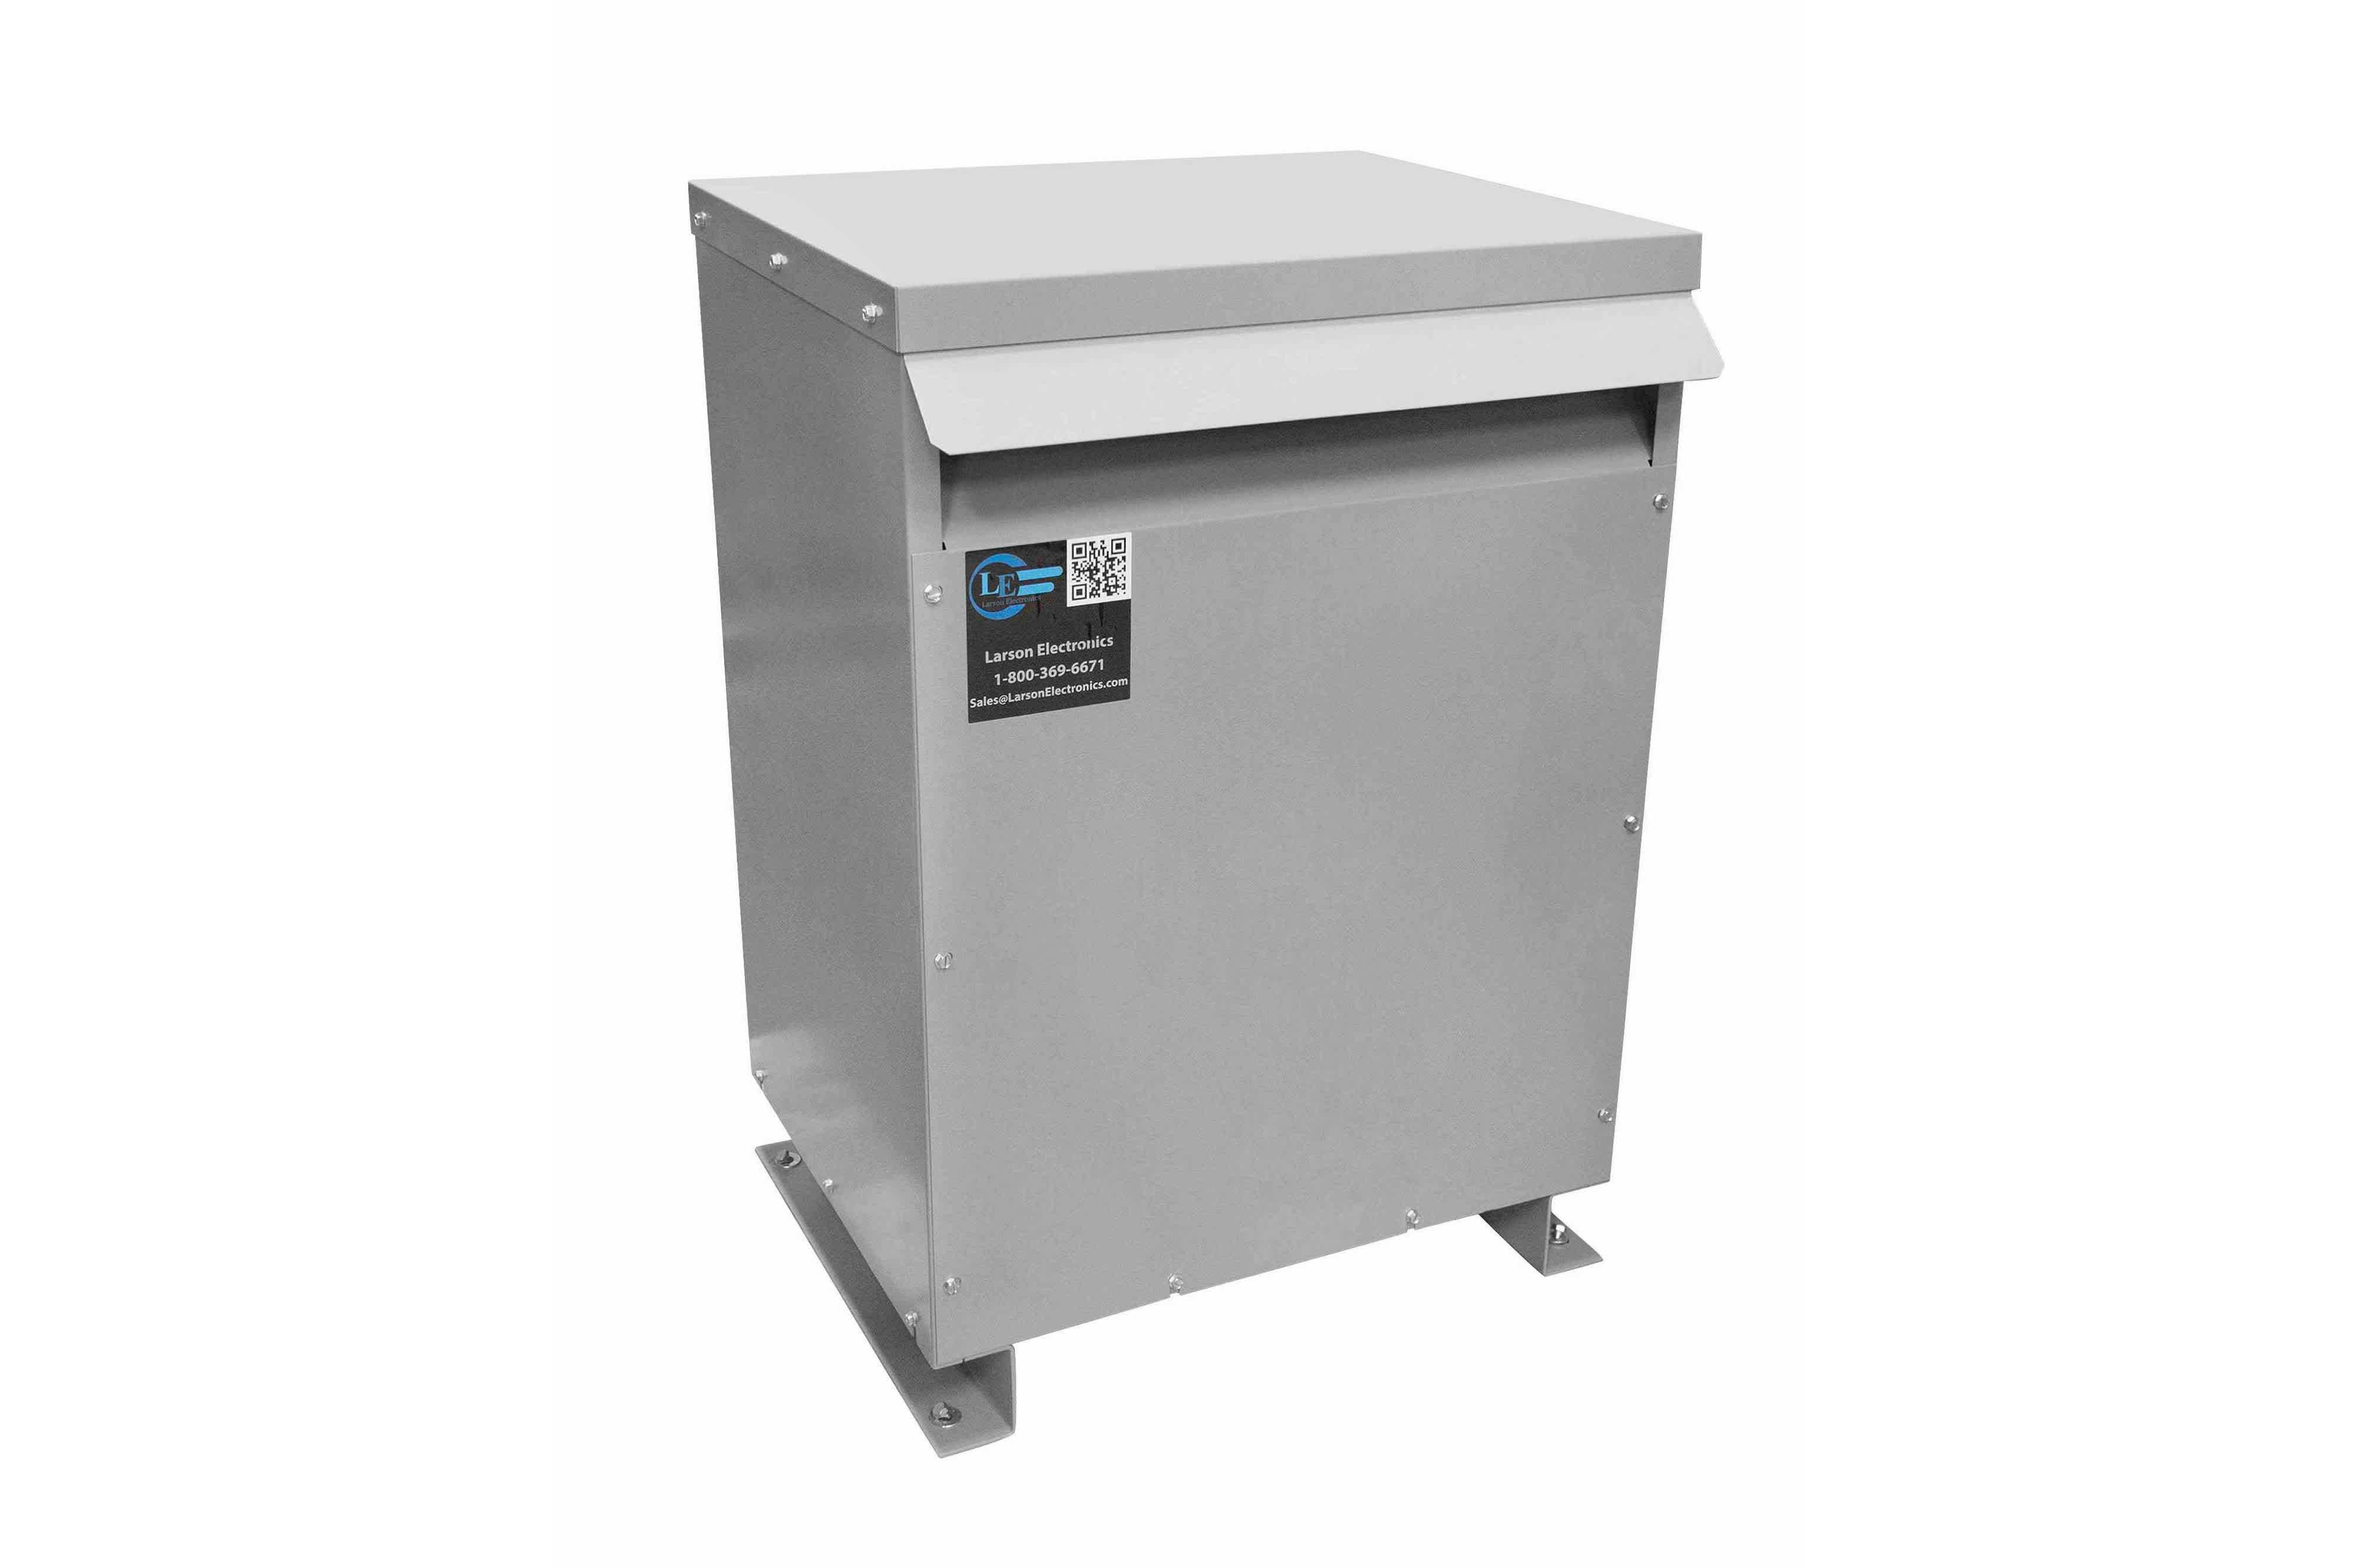 275 kVA 3PH Isolation Transformer, 400V Wye Primary, 600Y/347 Wye-N Secondary, N3R, Ventilated, 60 Hz